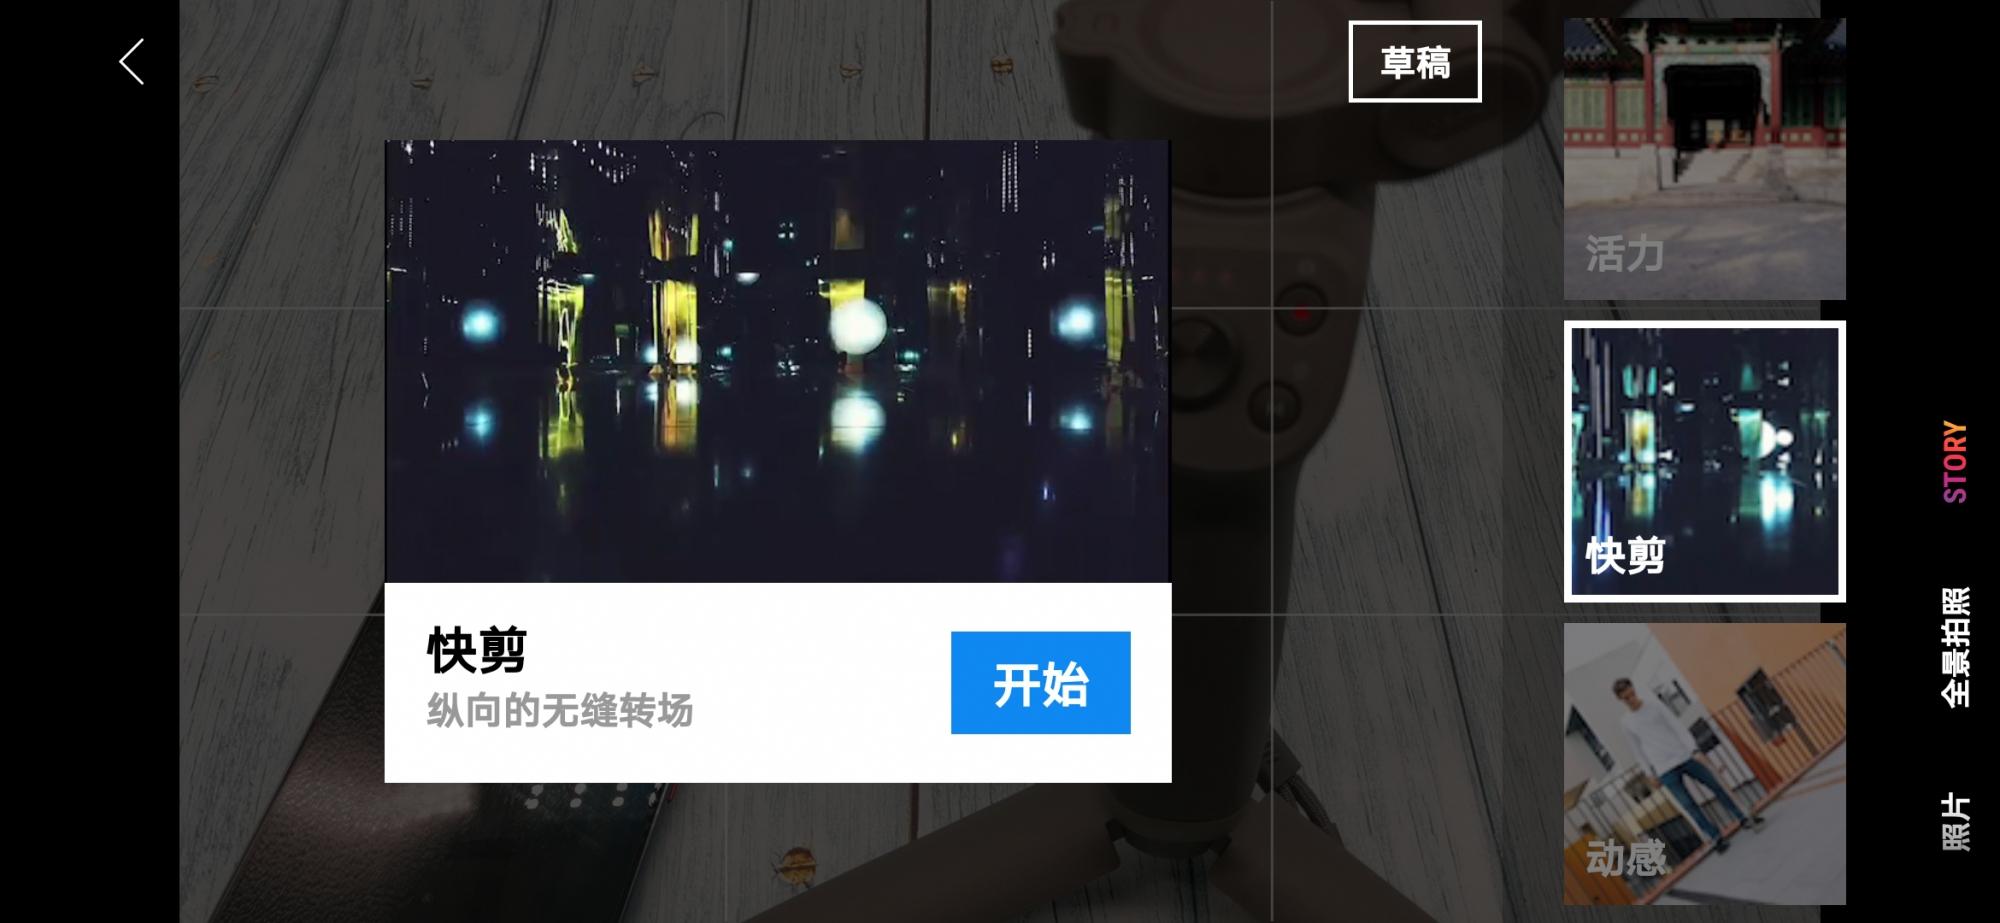 Screenshot_20191006_185244_dji.mimo.jpg